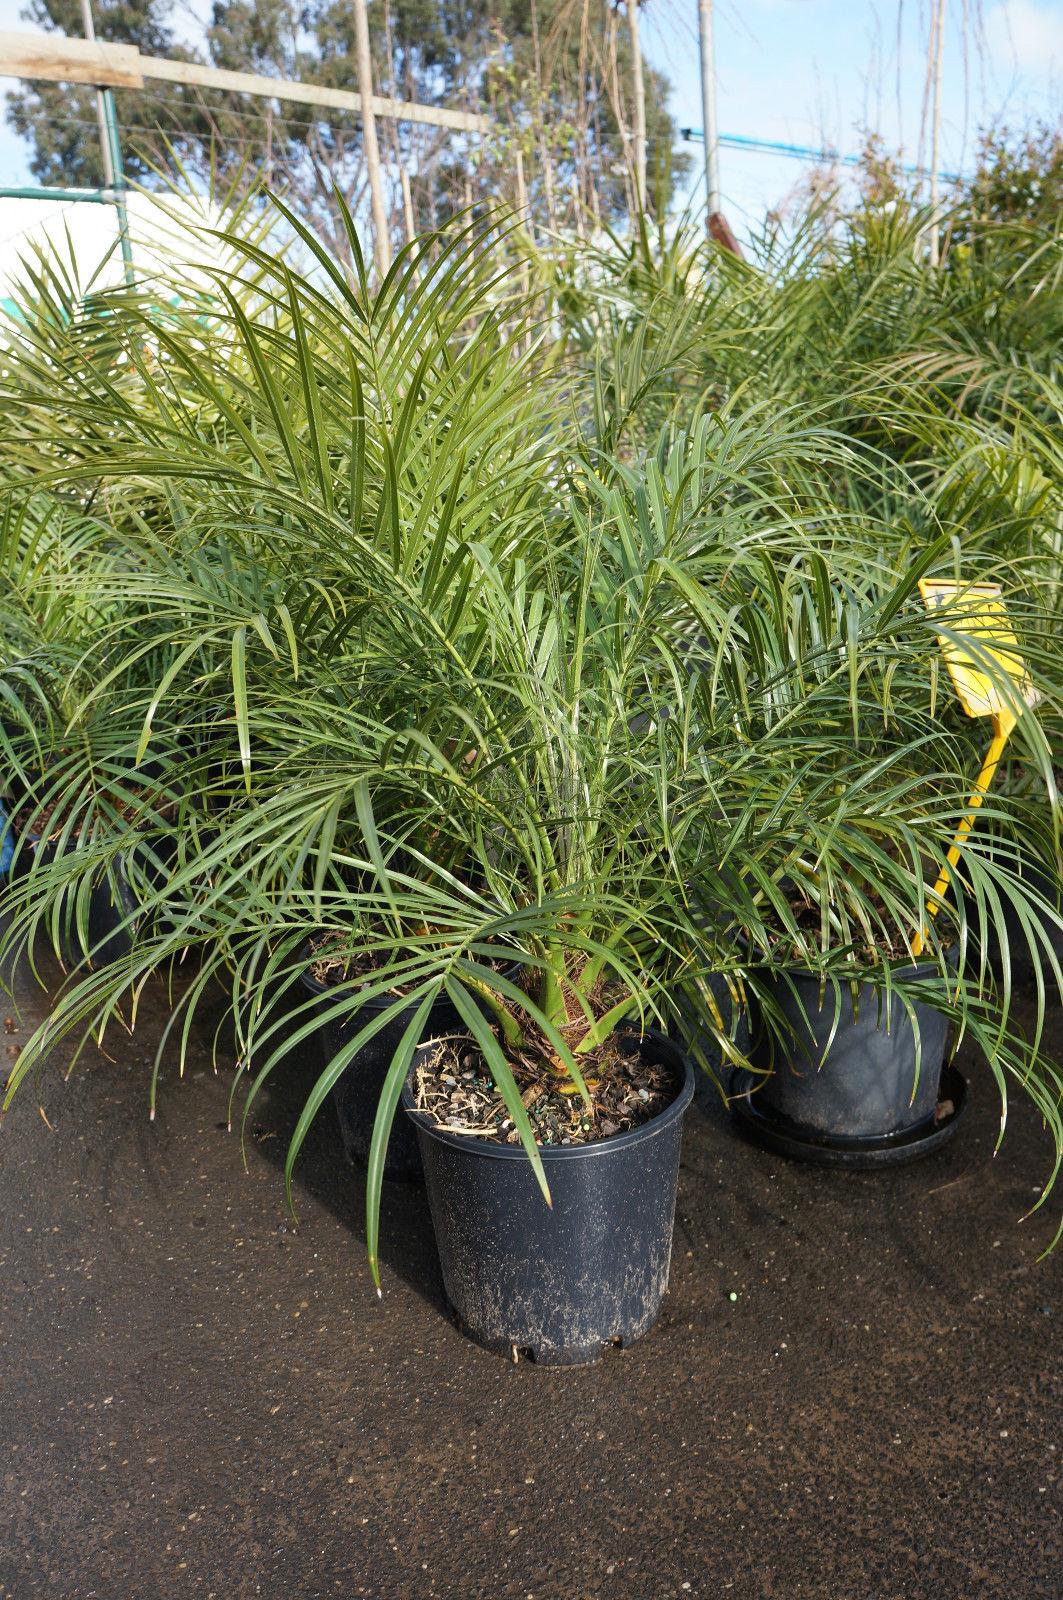 Dwarf Date Palm | Flickr - Photo Sharing!